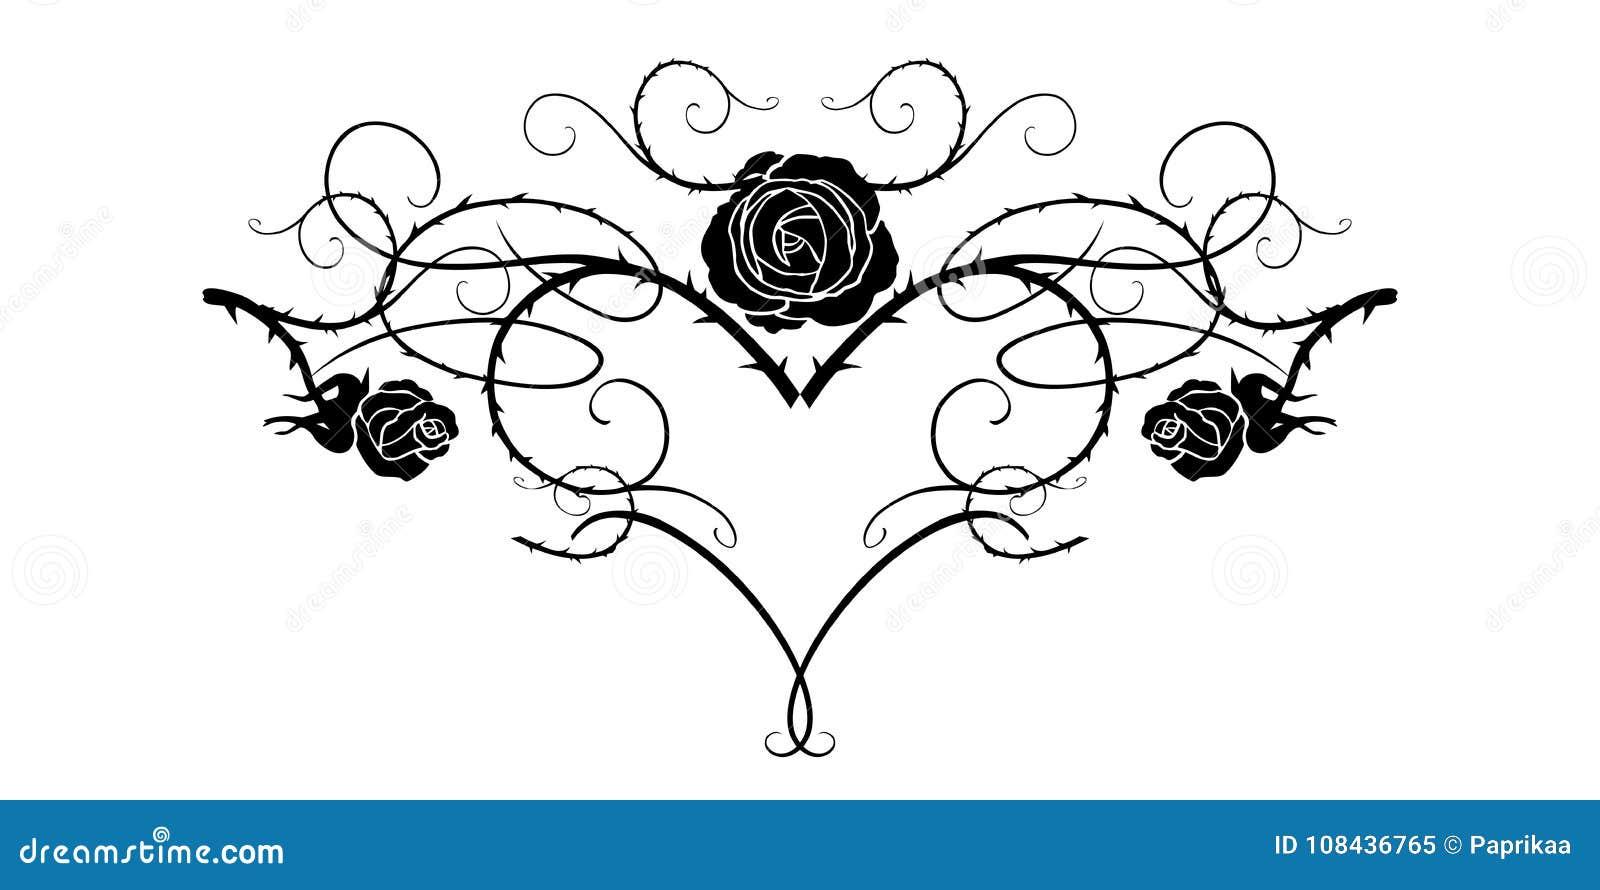 Black Tattoo Flower Stock Vector Illustration Of Line 108436765